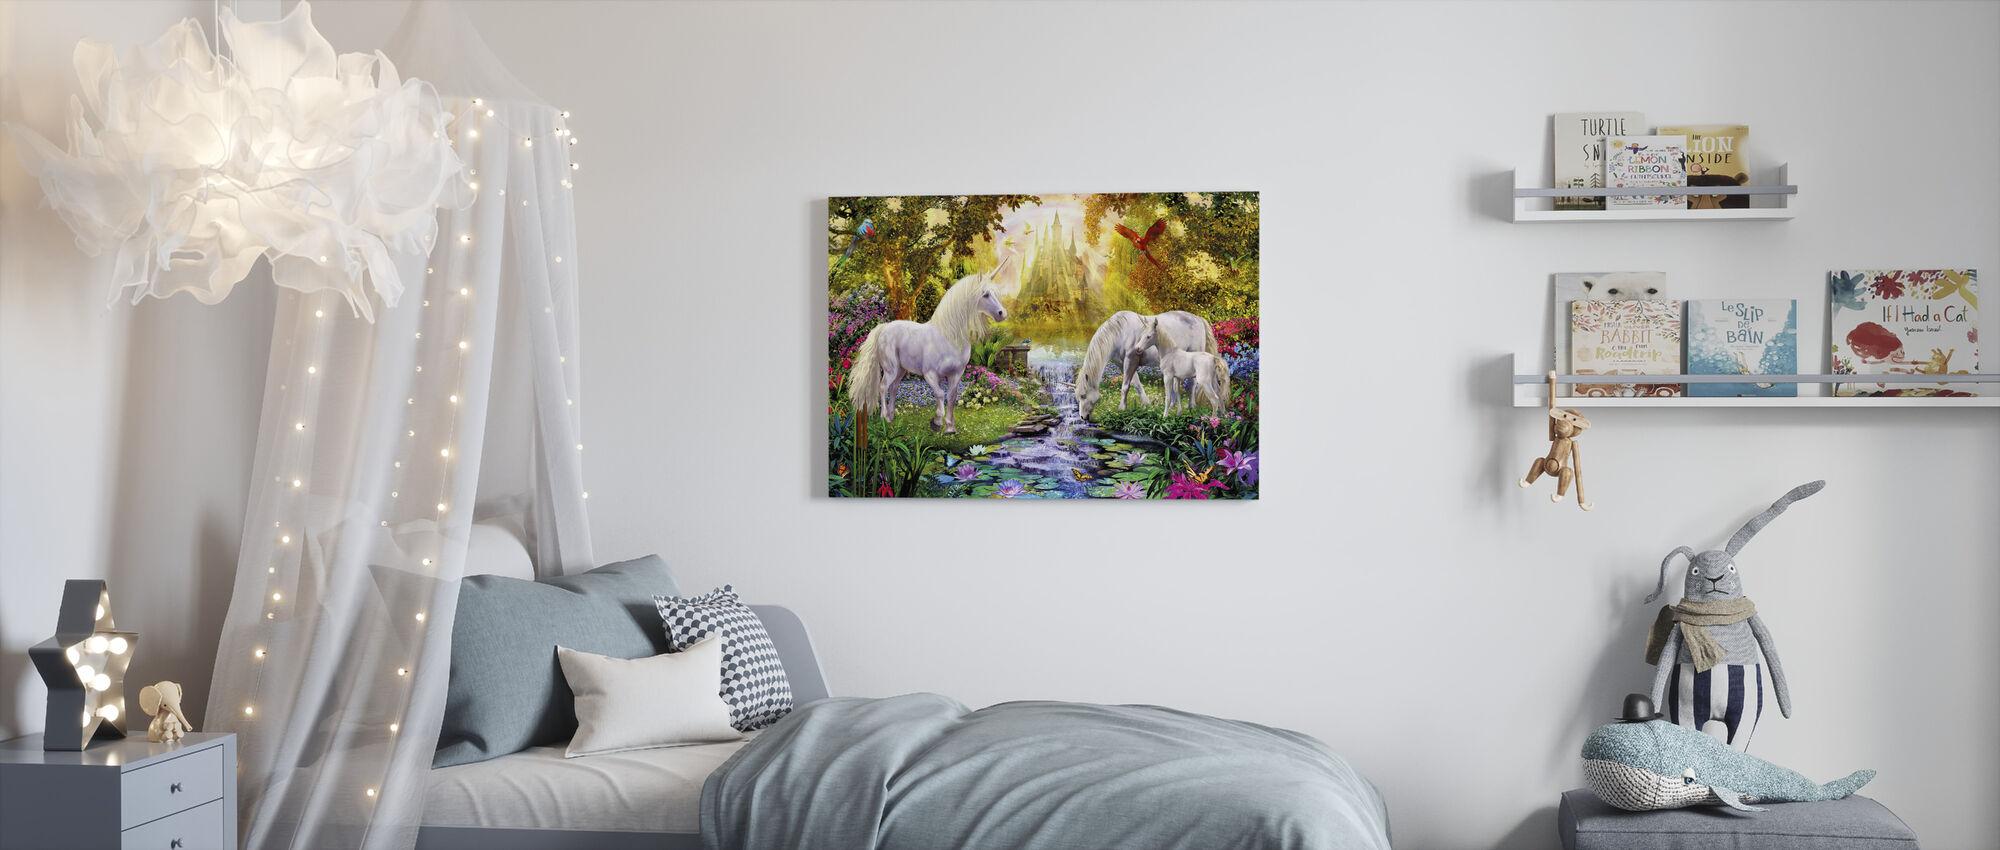 Slottet Unicorn Garden - Canvastavla - Barnrum